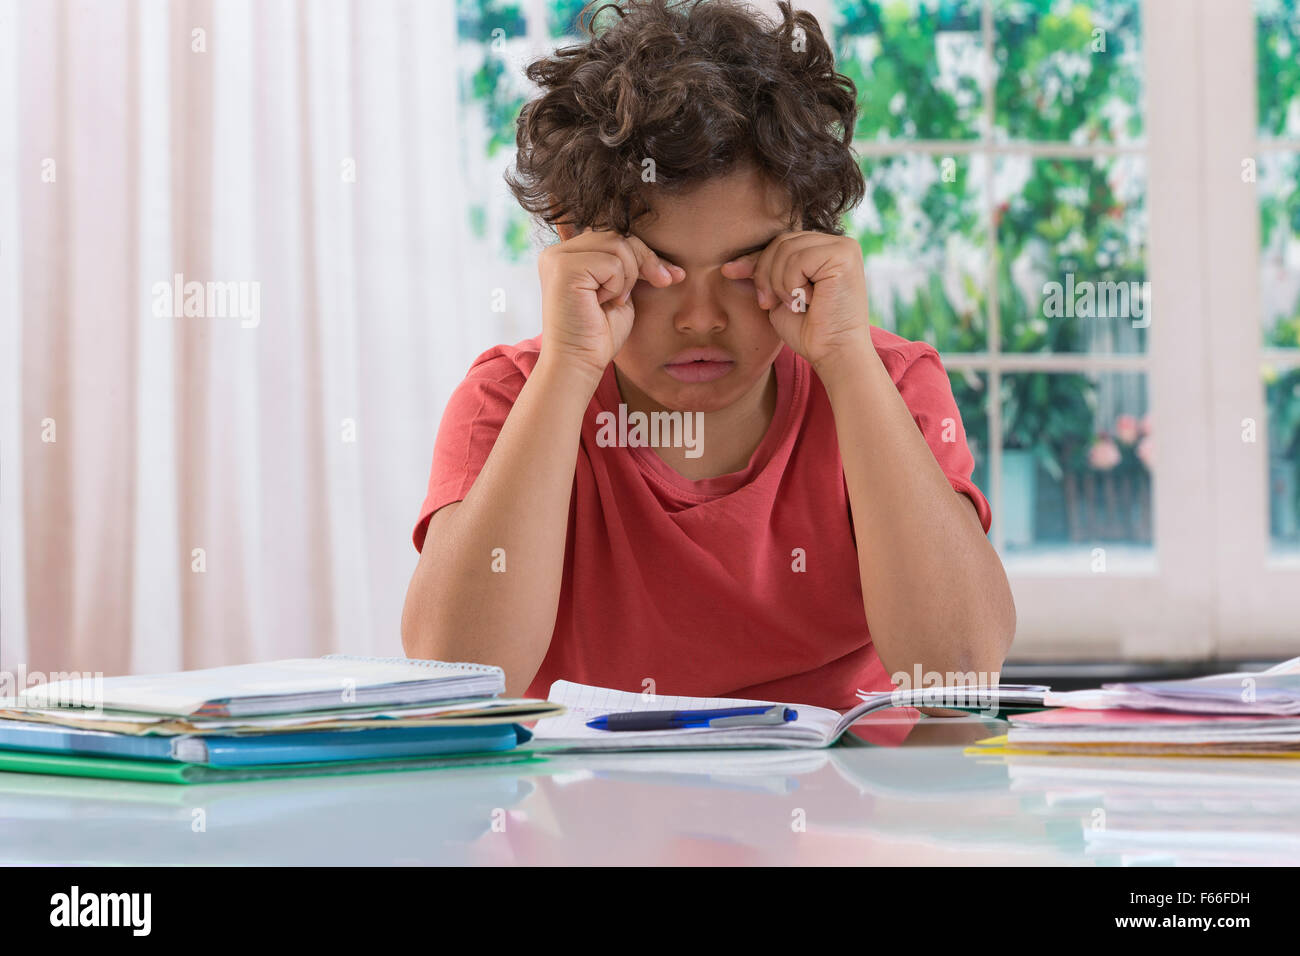 School boy rubbing eyes after long time homework - Stock Image